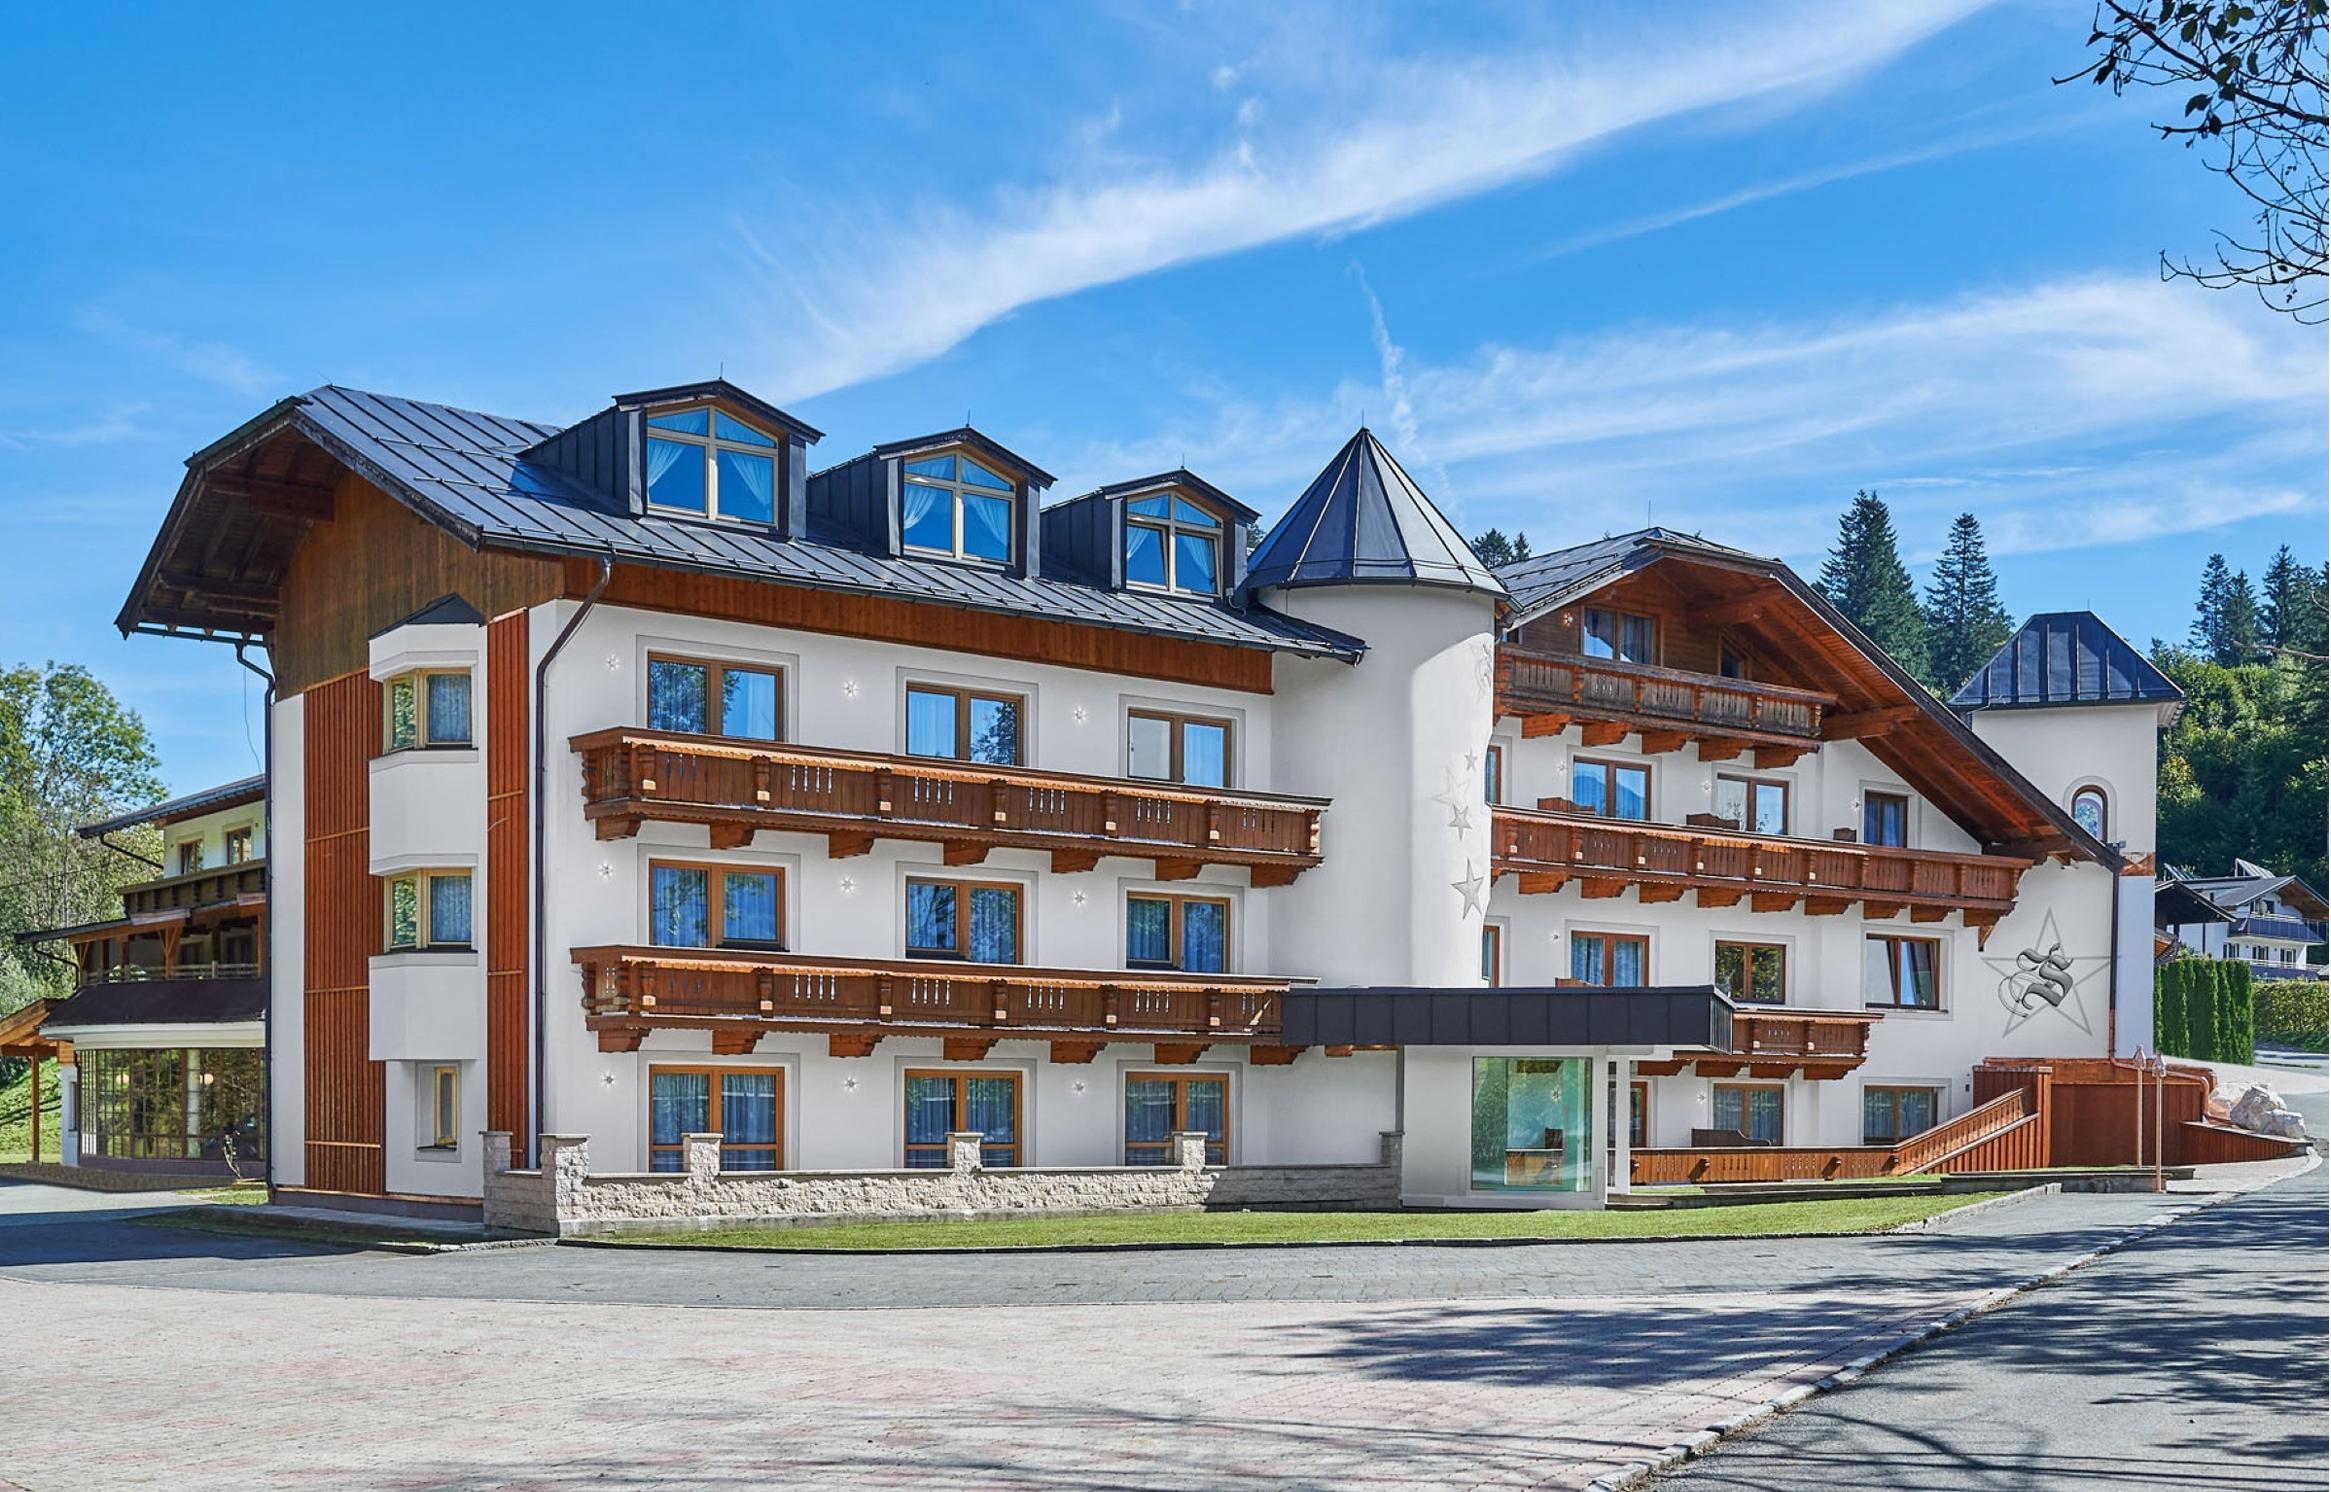 Meer info over Hotel Zum Sternenhof  bij Summittravel